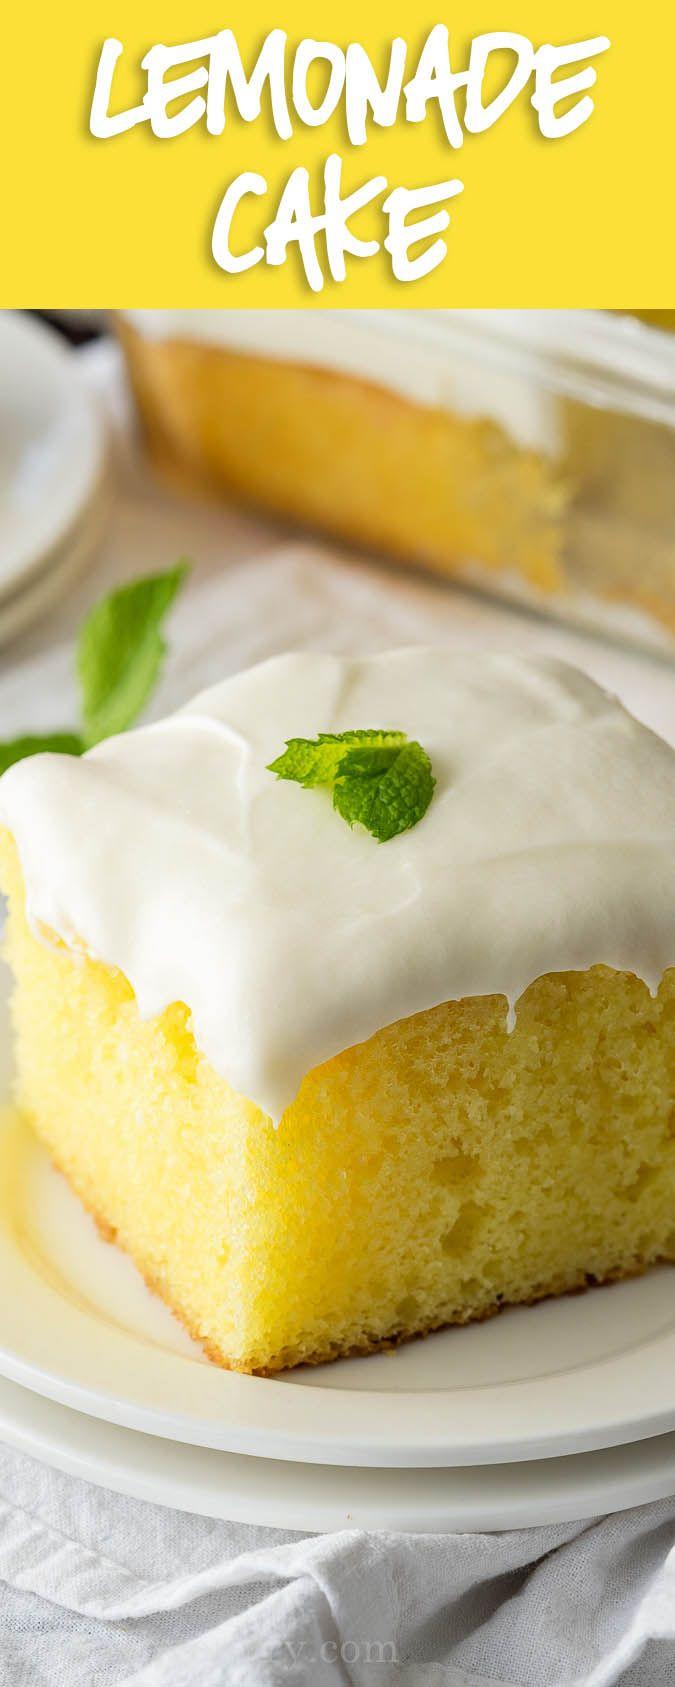 Super Easy Lemonade Cake Recipe via @iwashyoudry